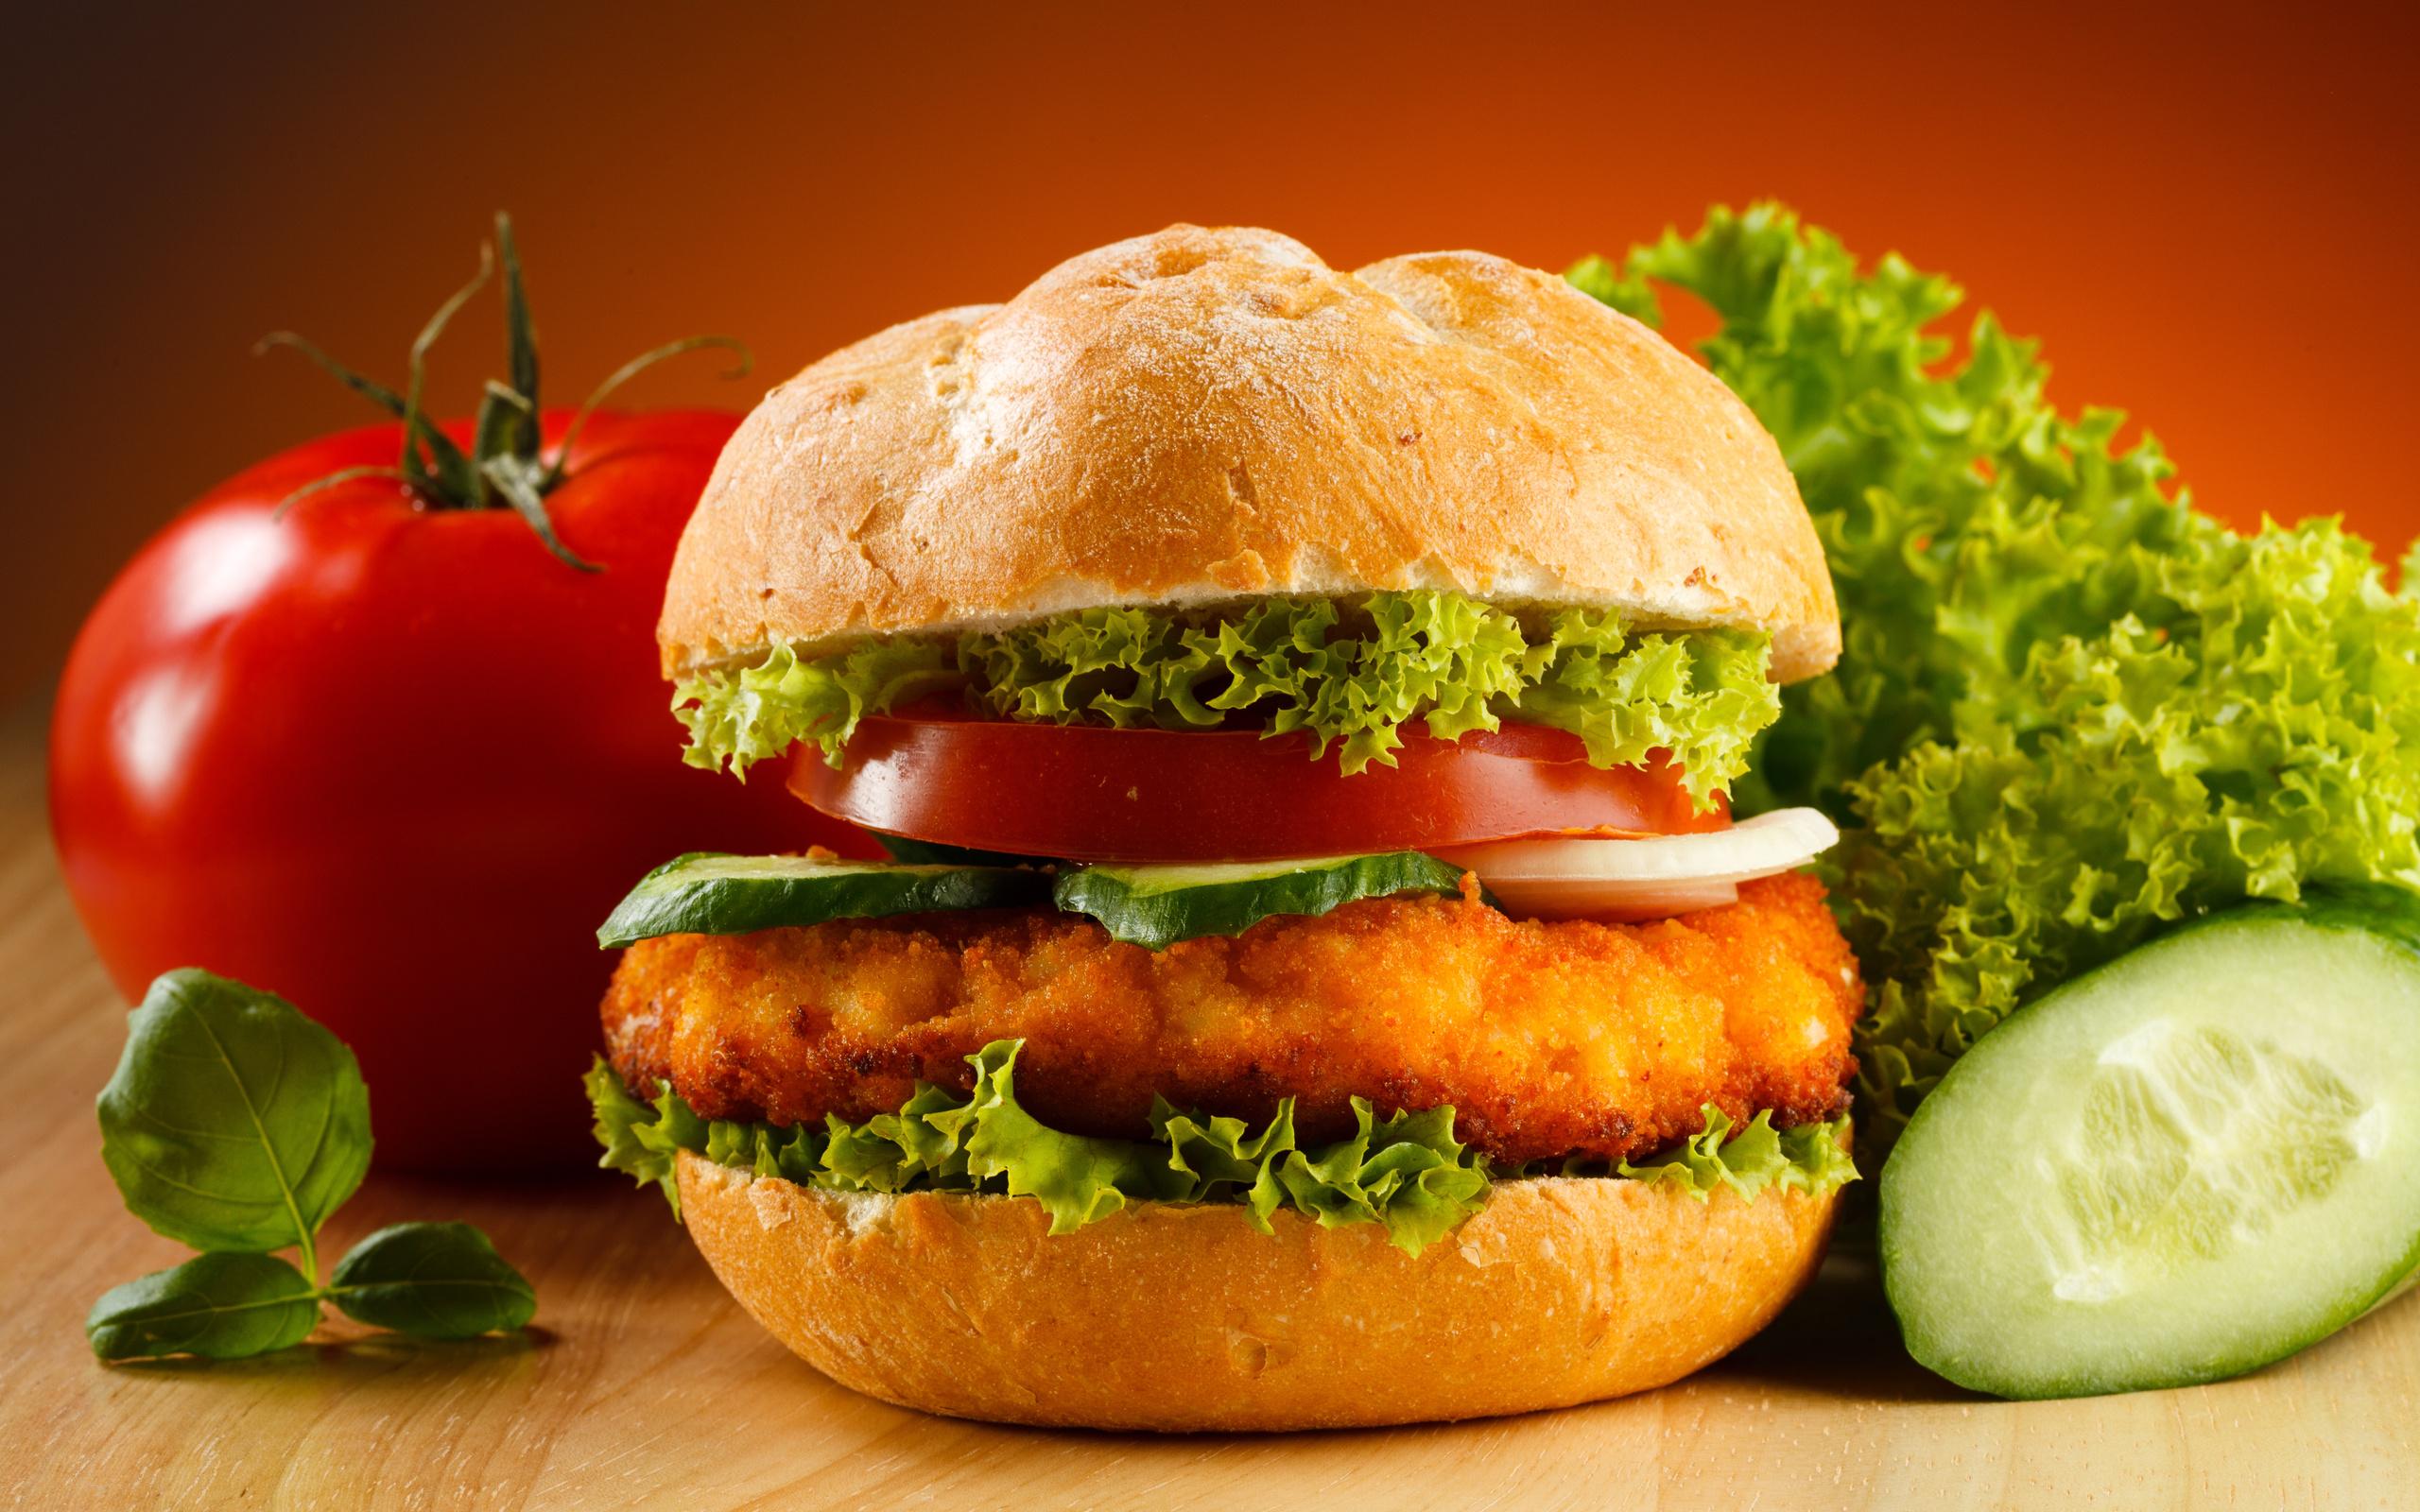 Junk Food HD Wallpapers 2560x1600